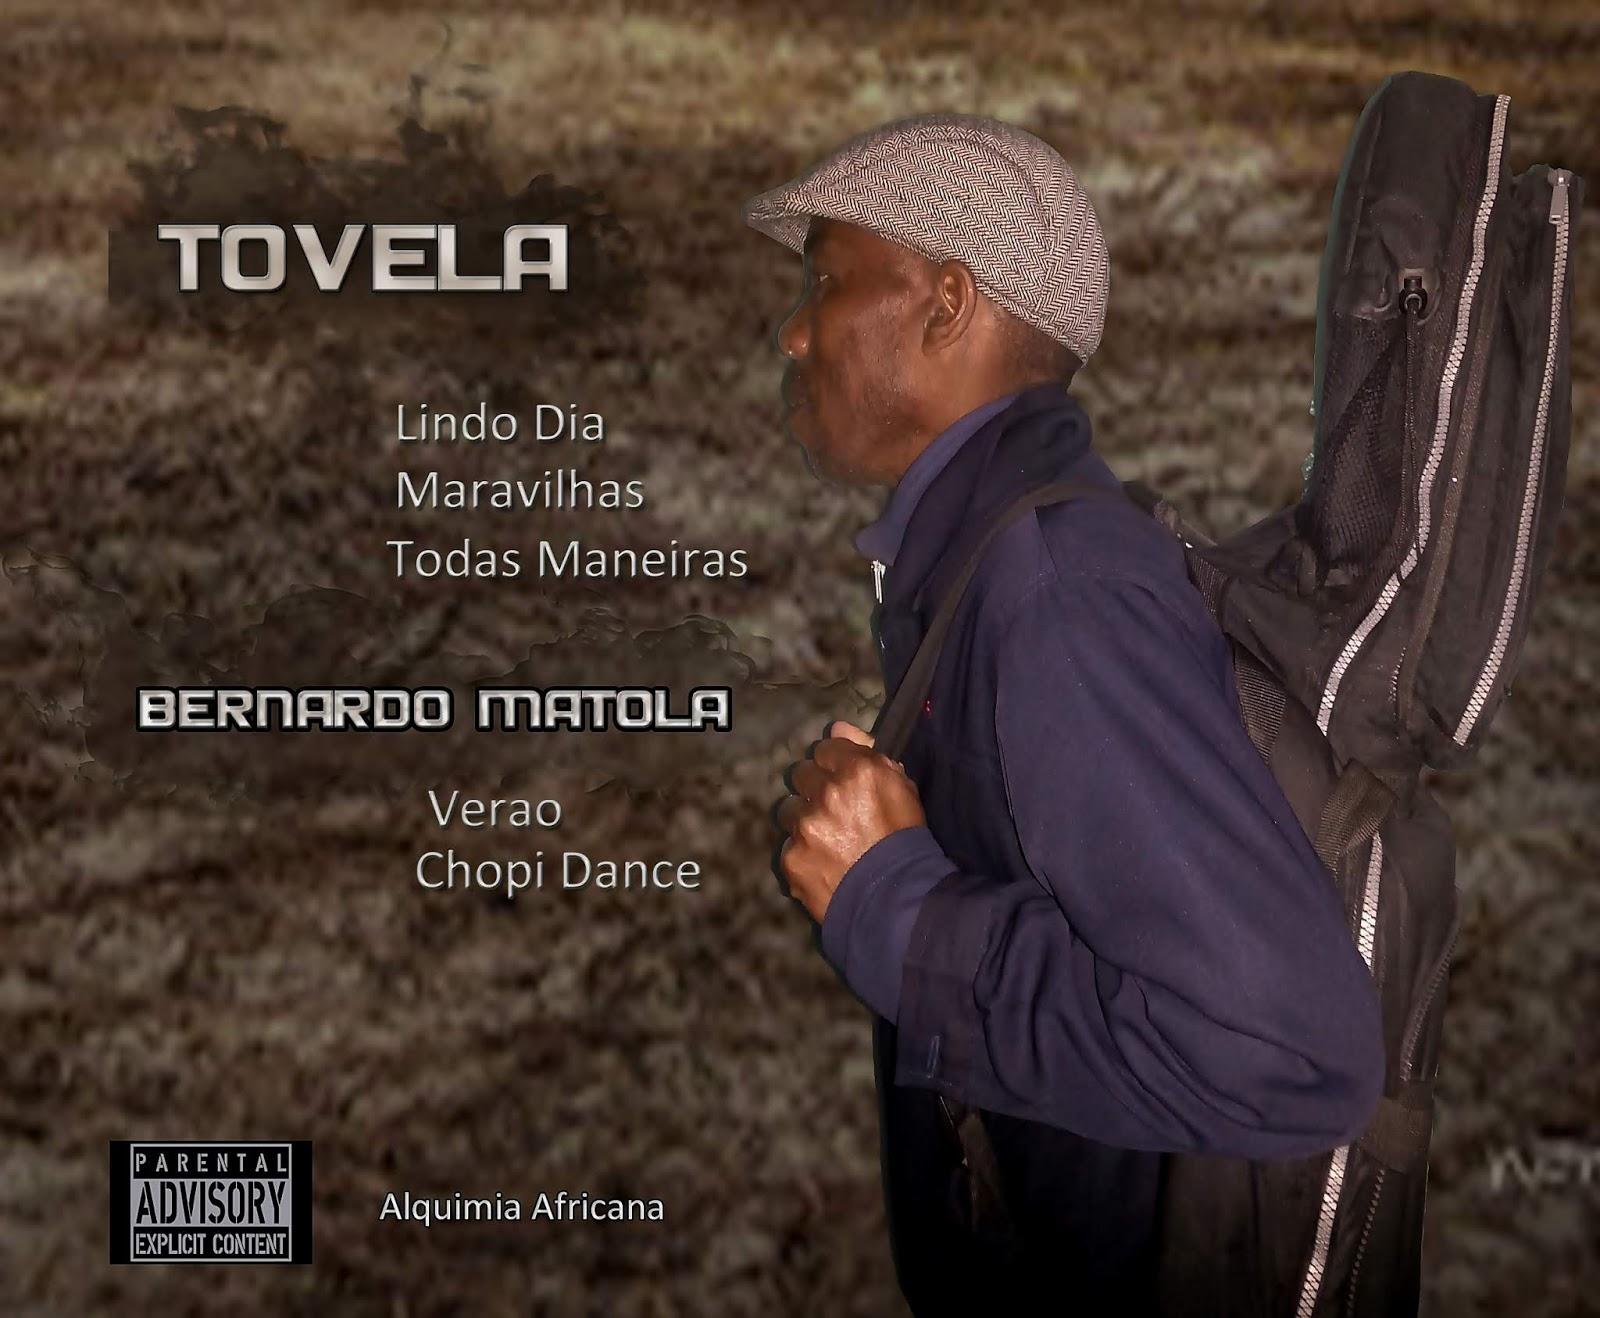 Tovela & Bernardo Matola - Alquimia Africana (EP)